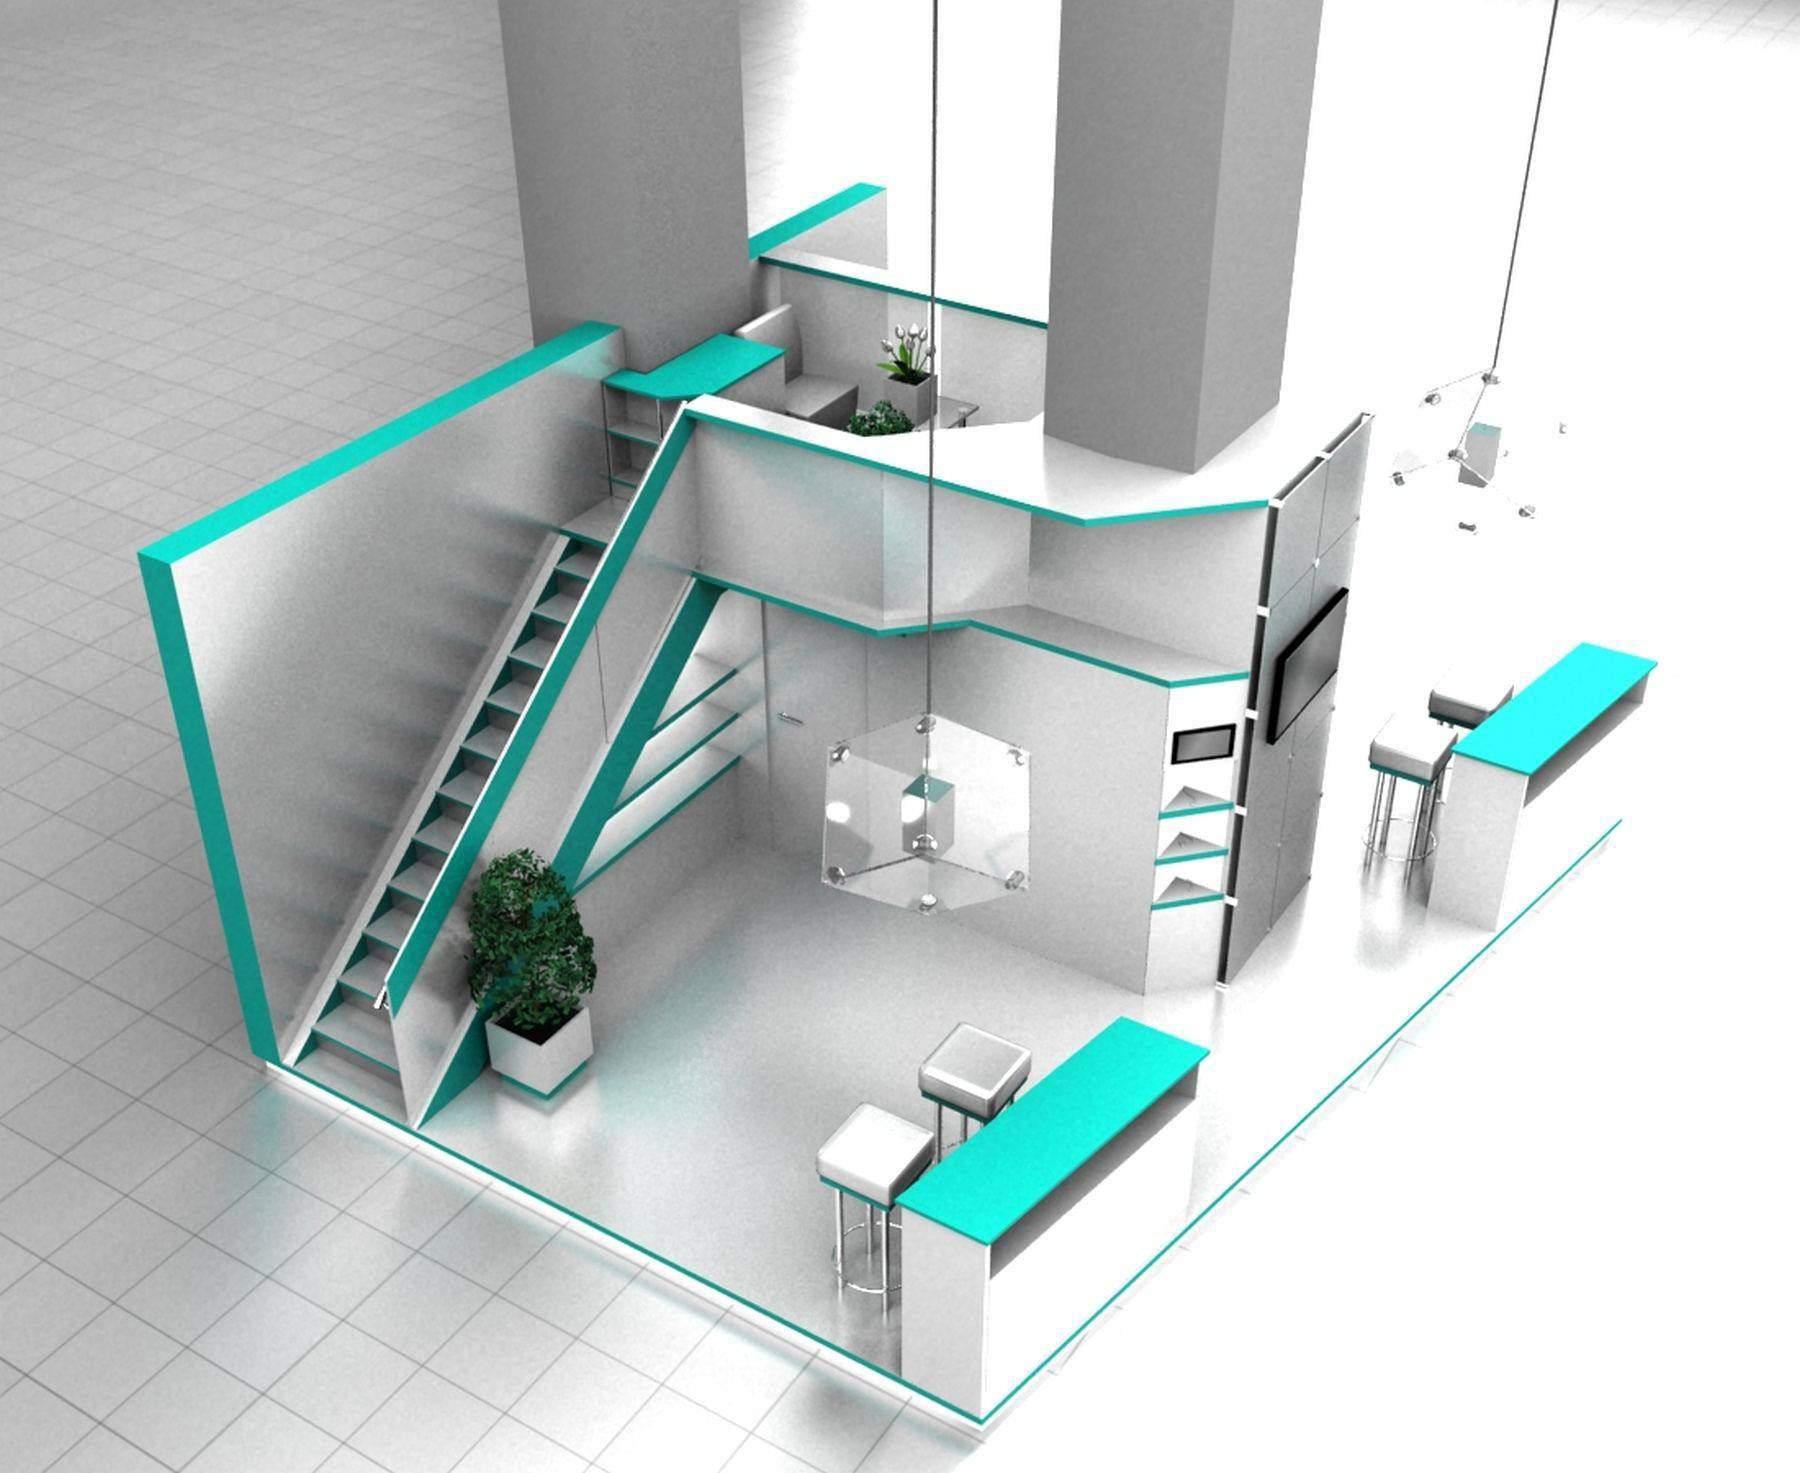 Exhibition stand modeling portfolio